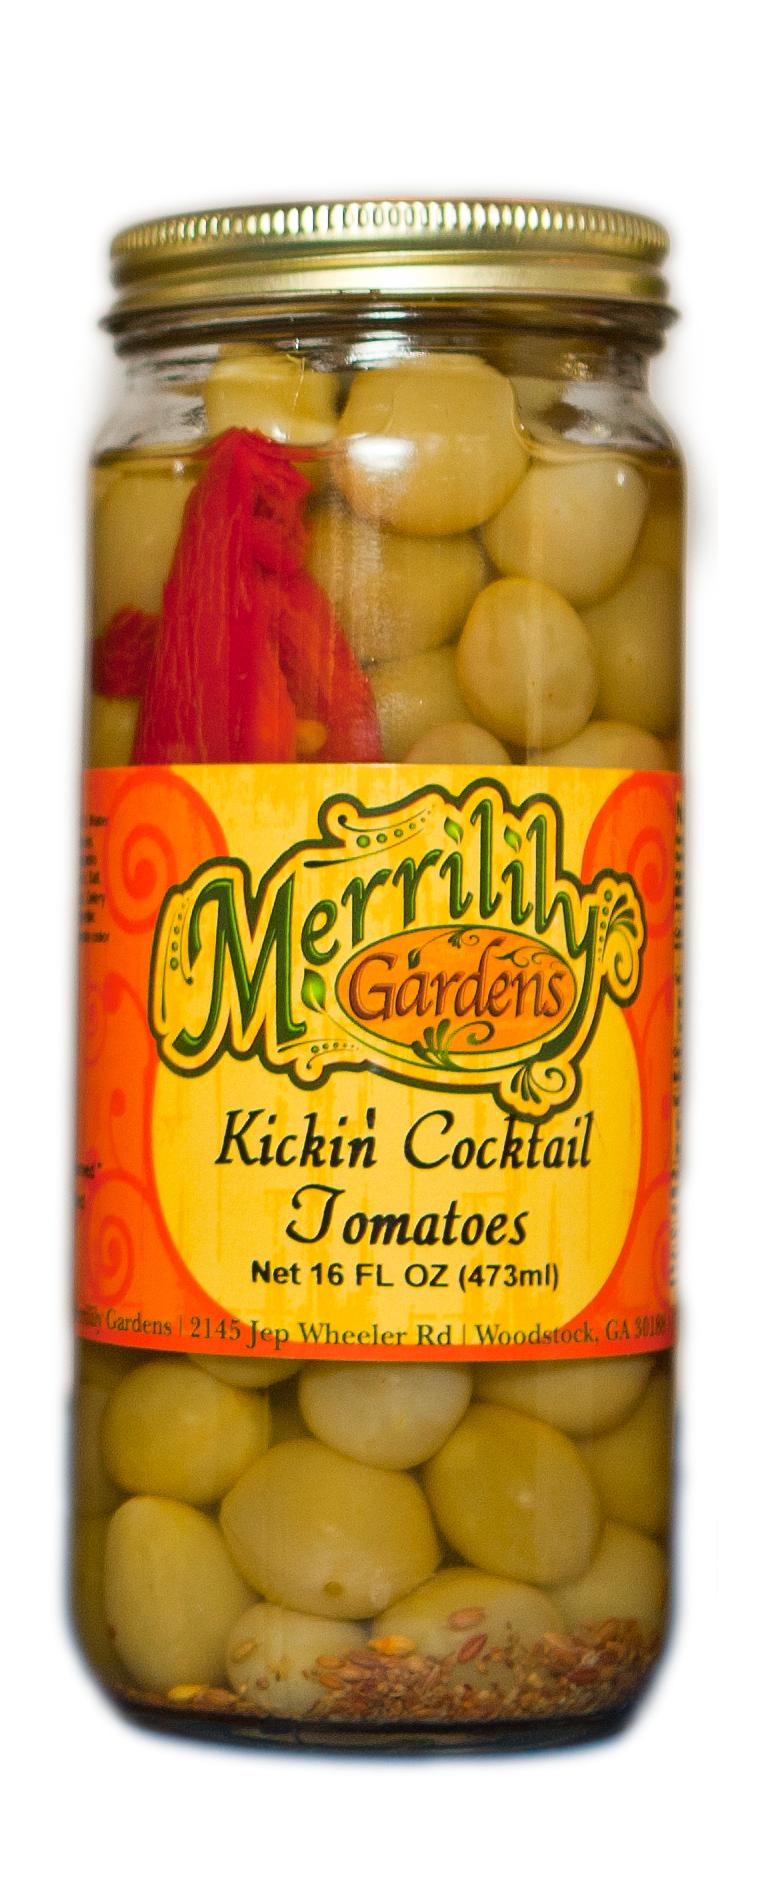 Kickin' Cocktail Tomatoes